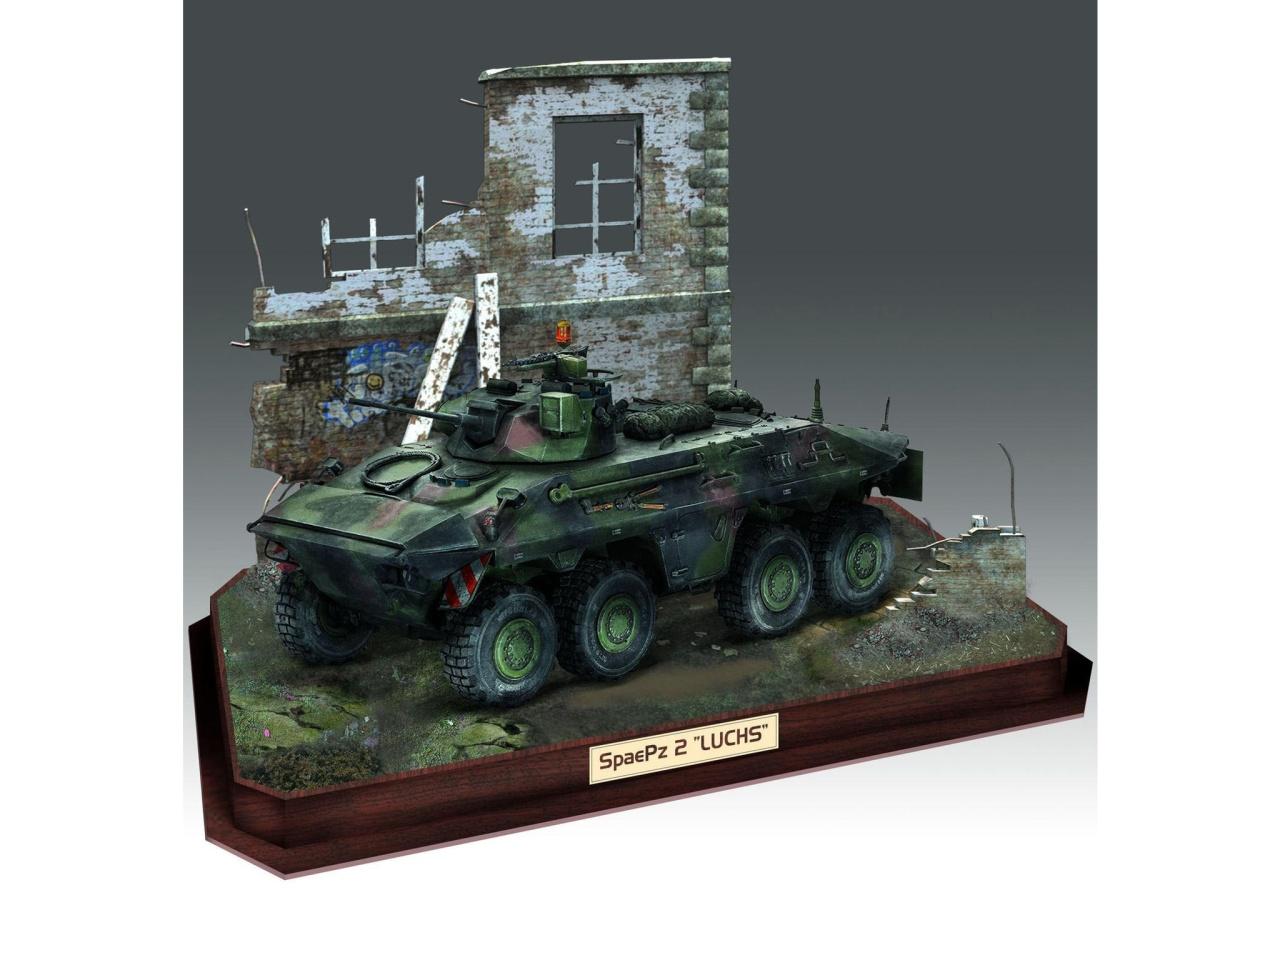 3D Puzzle Diorama & SpPz2 Luchs 1:35